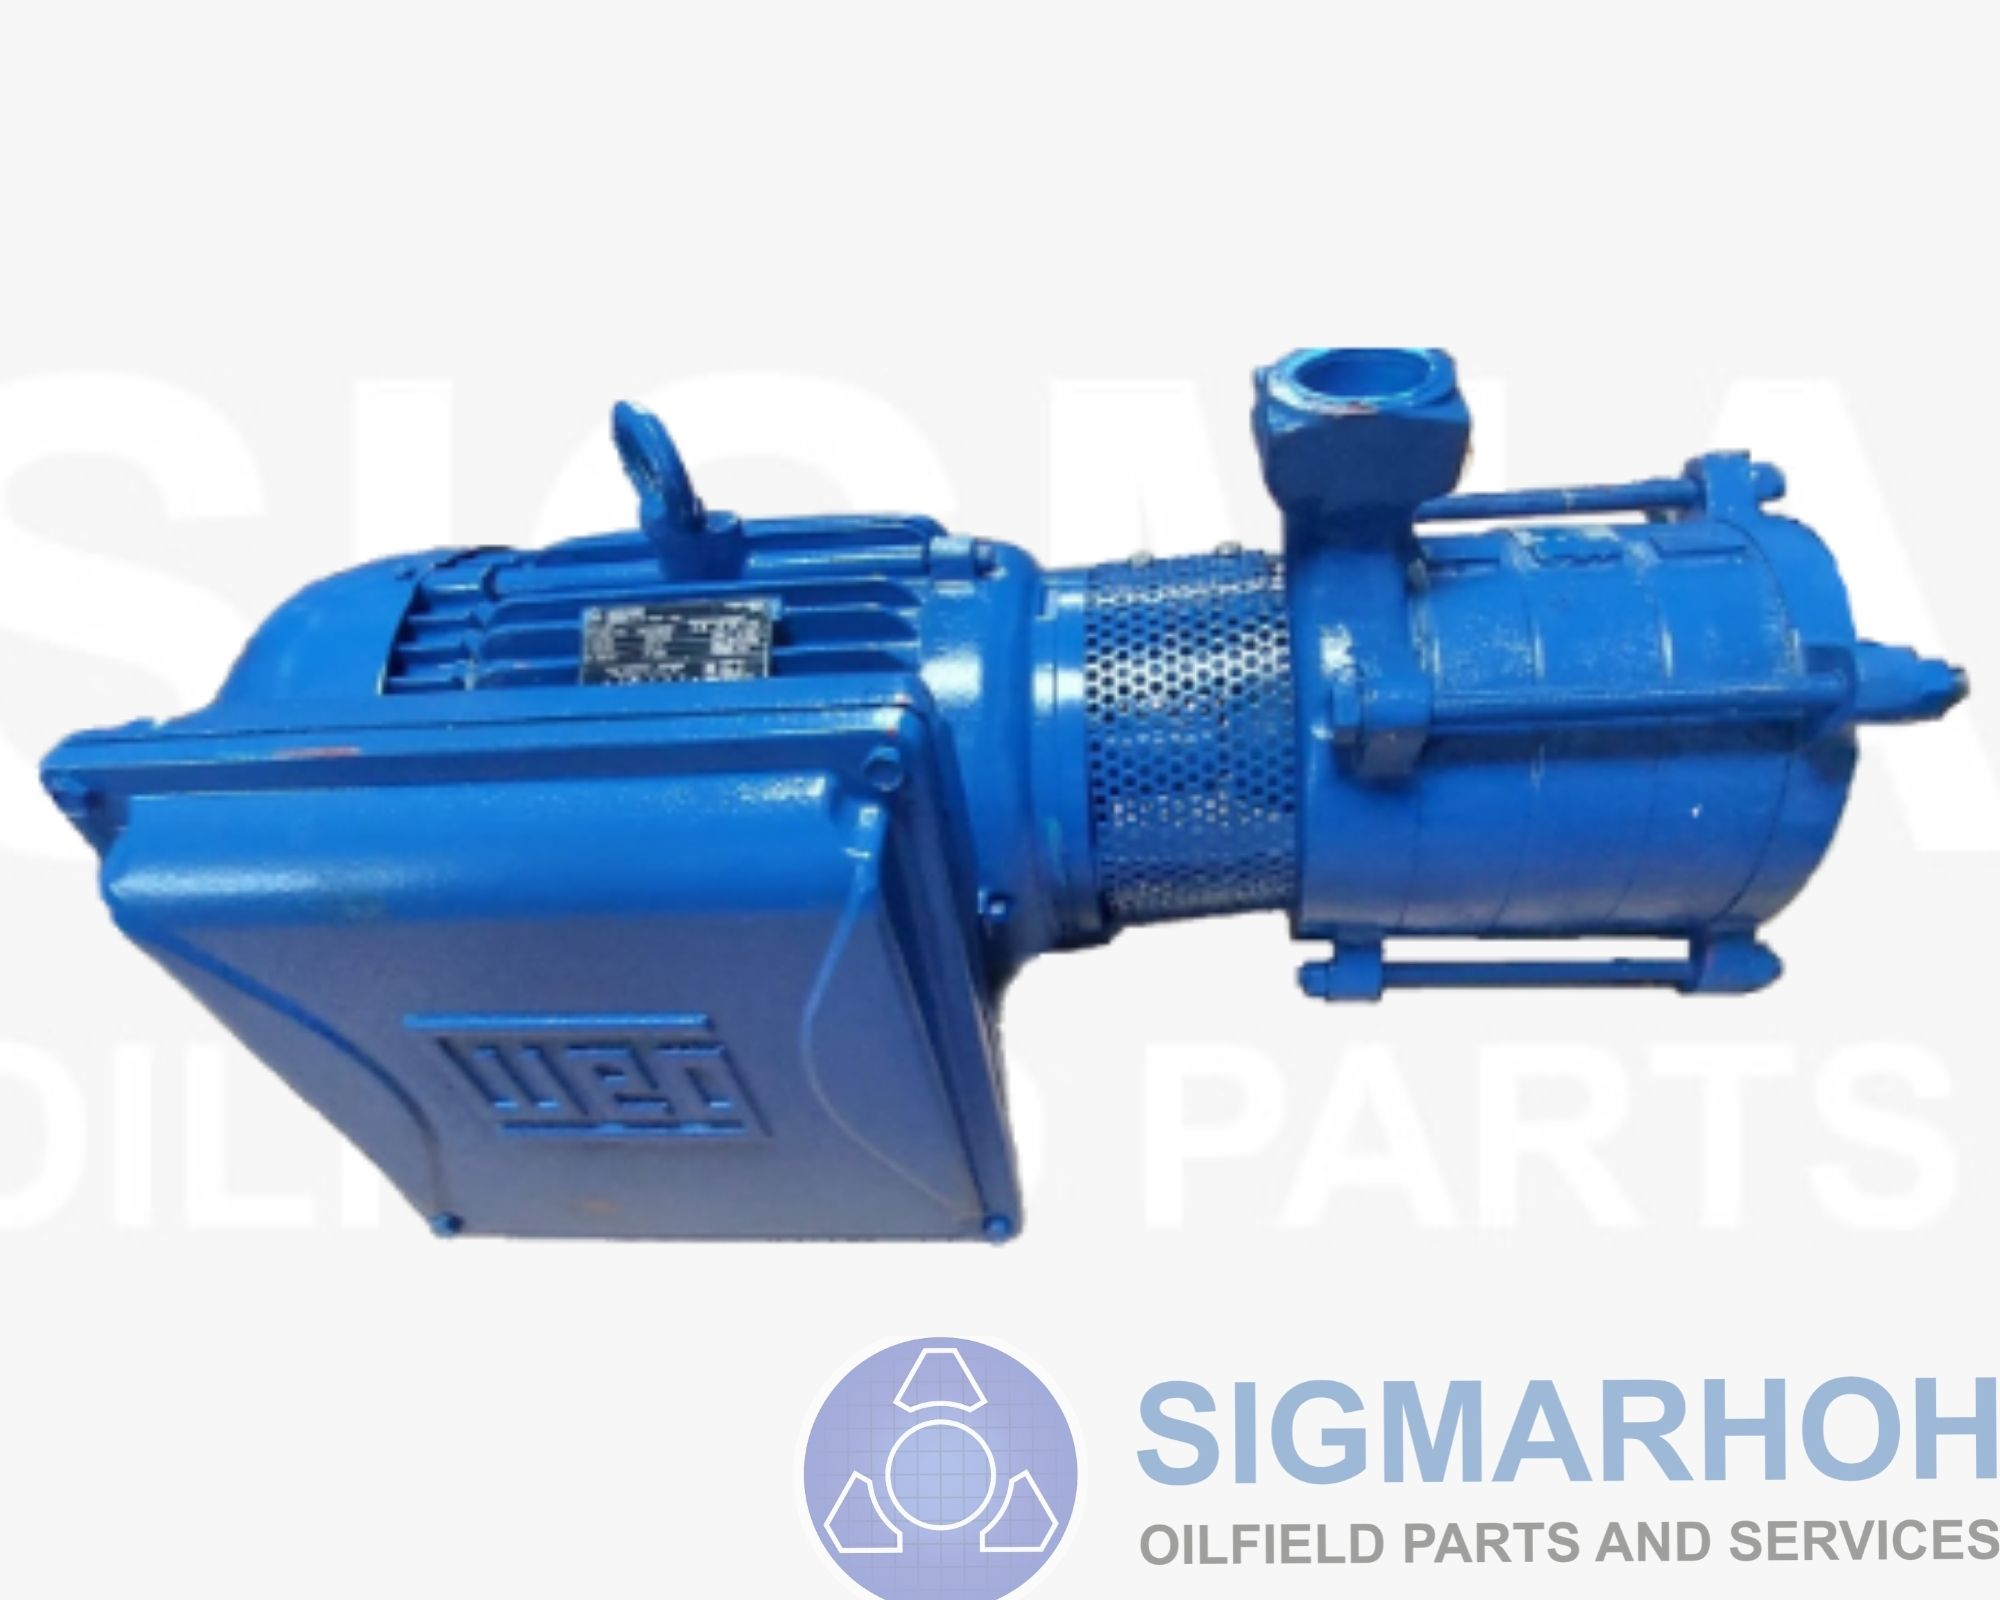 Motor Bomba Elétrica Centrífuga Múltiplo Estágio / Multi Stage Eletric Centrifugal  Motor Pump